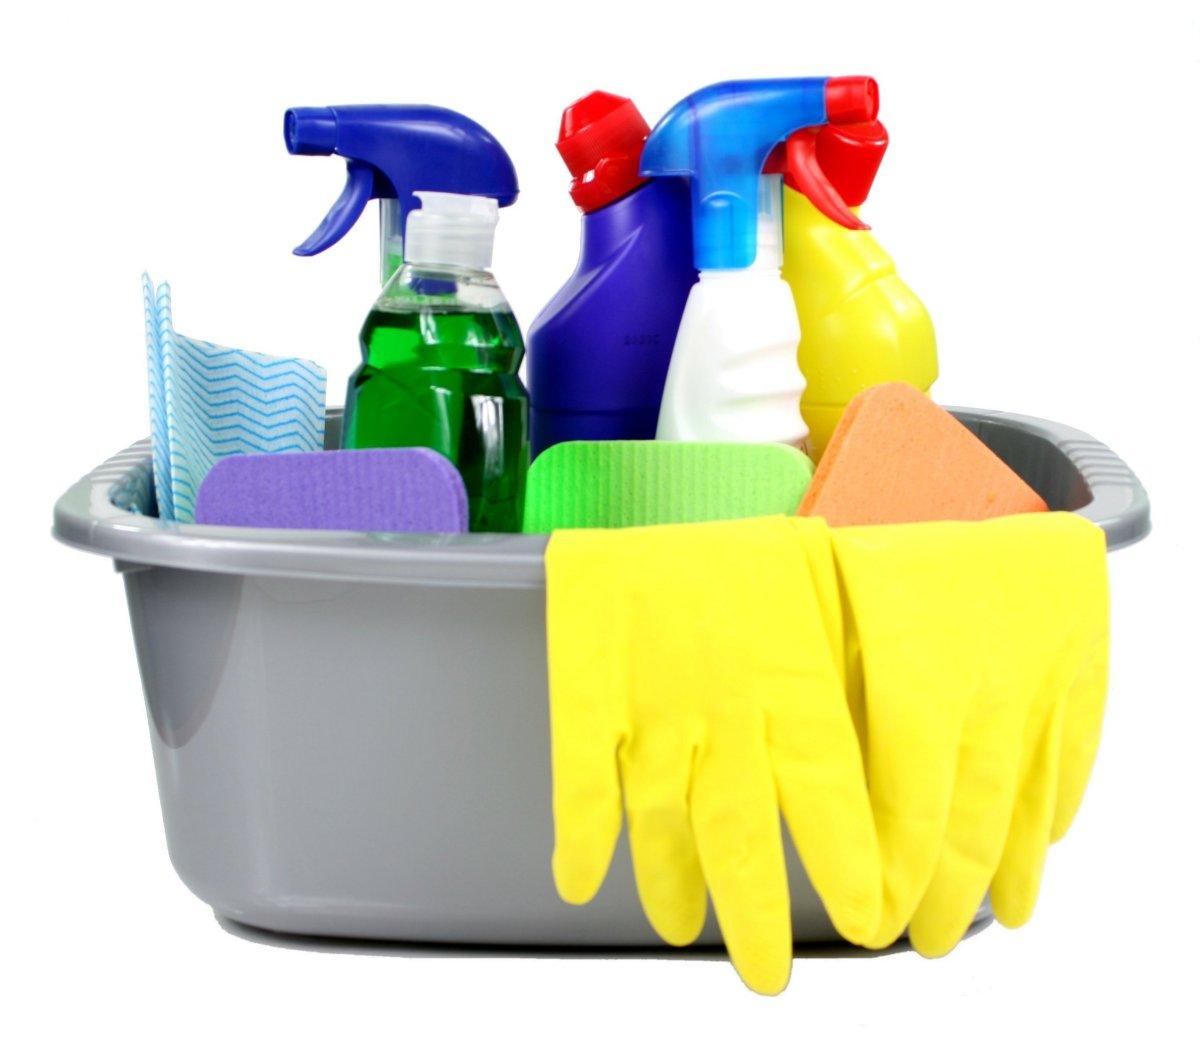 cleaning01-lg.jpg